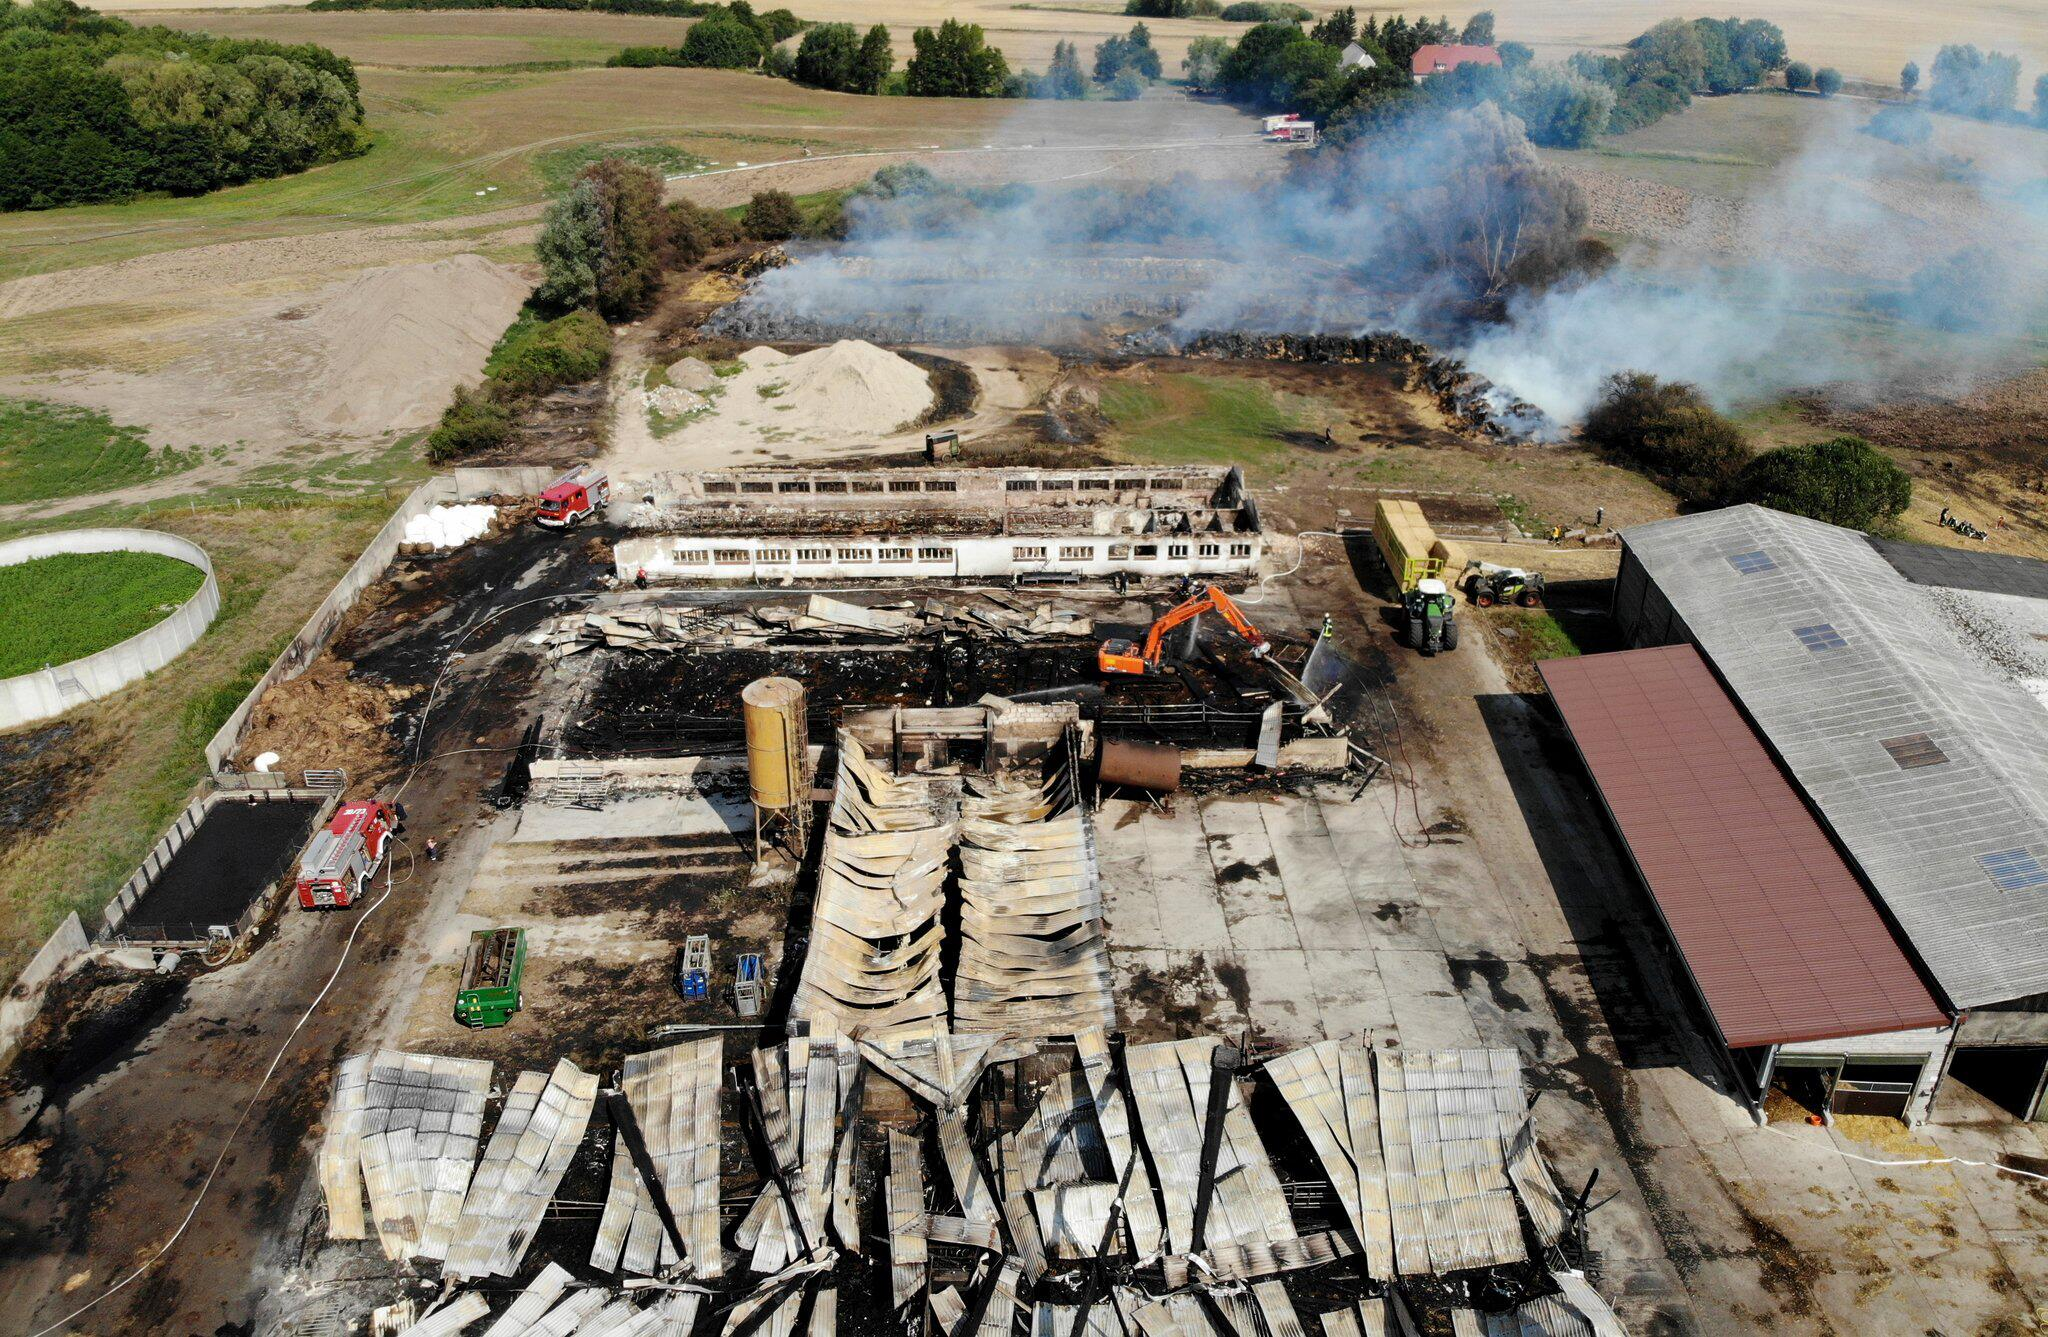 Bild zu Großbrand in Agrarbetrieb